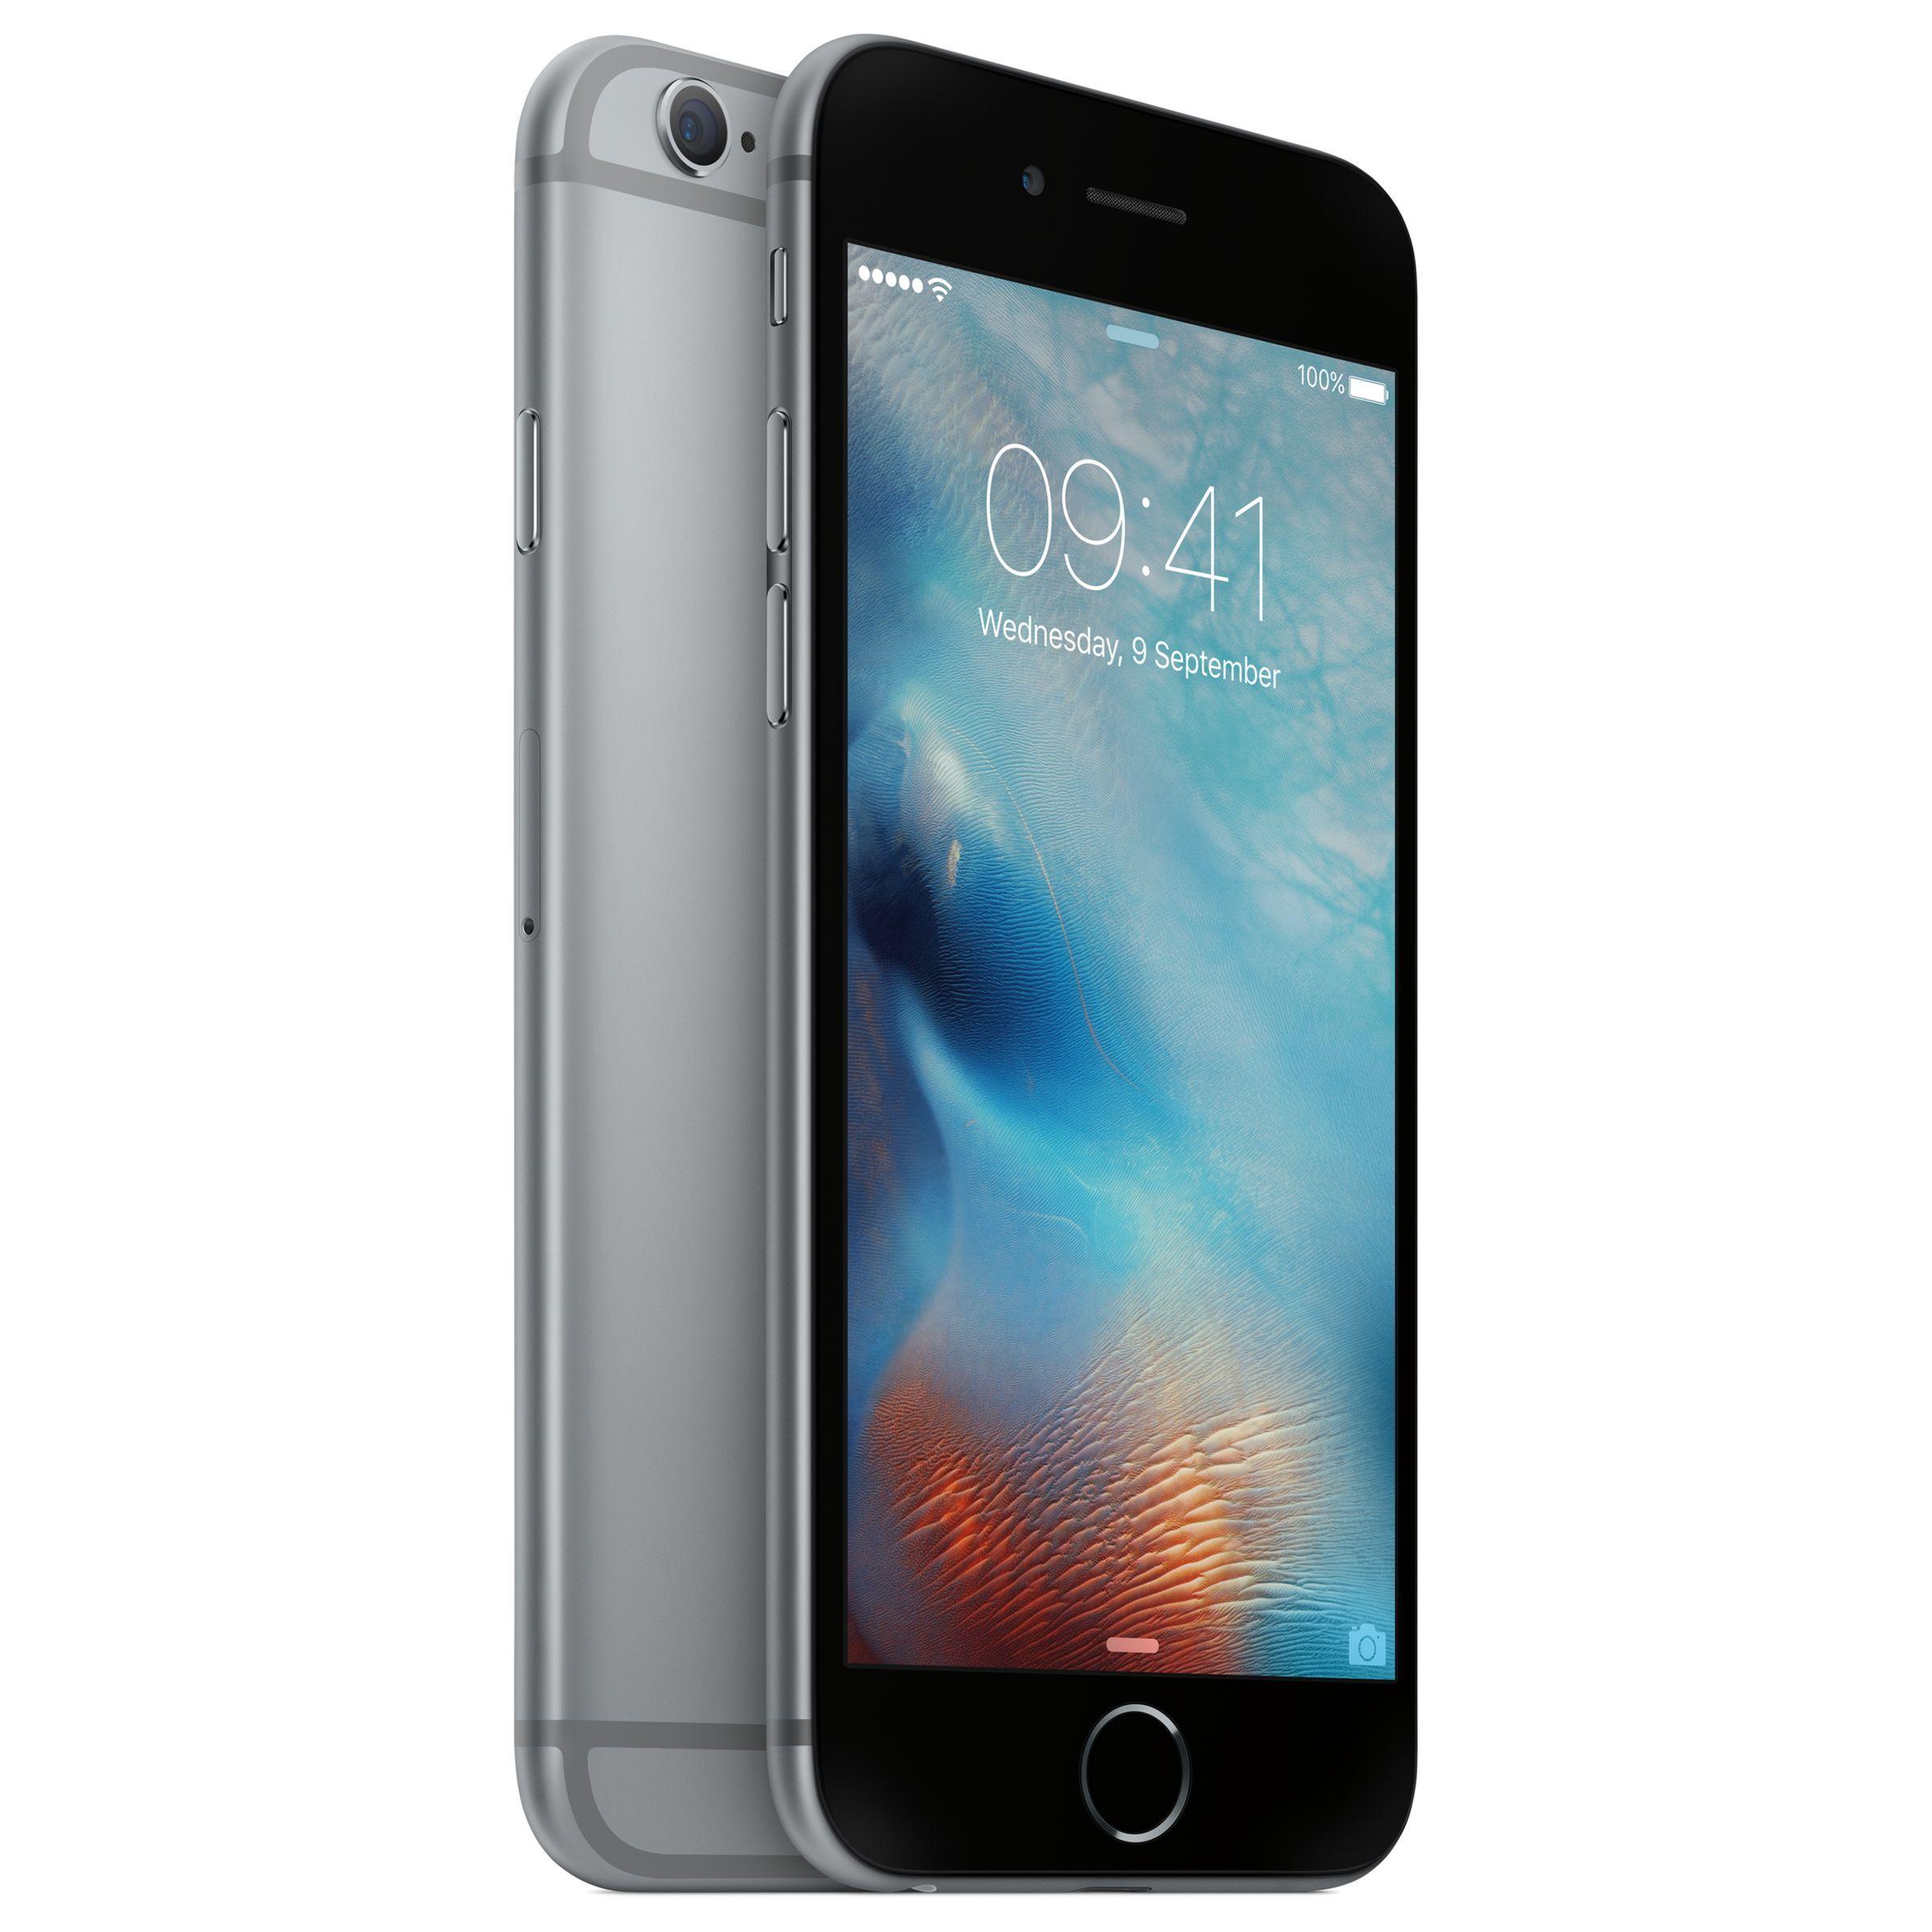 Apple Iphone 6s Ios 4 7 4g Lte Sim Free 32gb Apple Iphone Iphone 6s Space Grey Apple Iphone 6s Plus